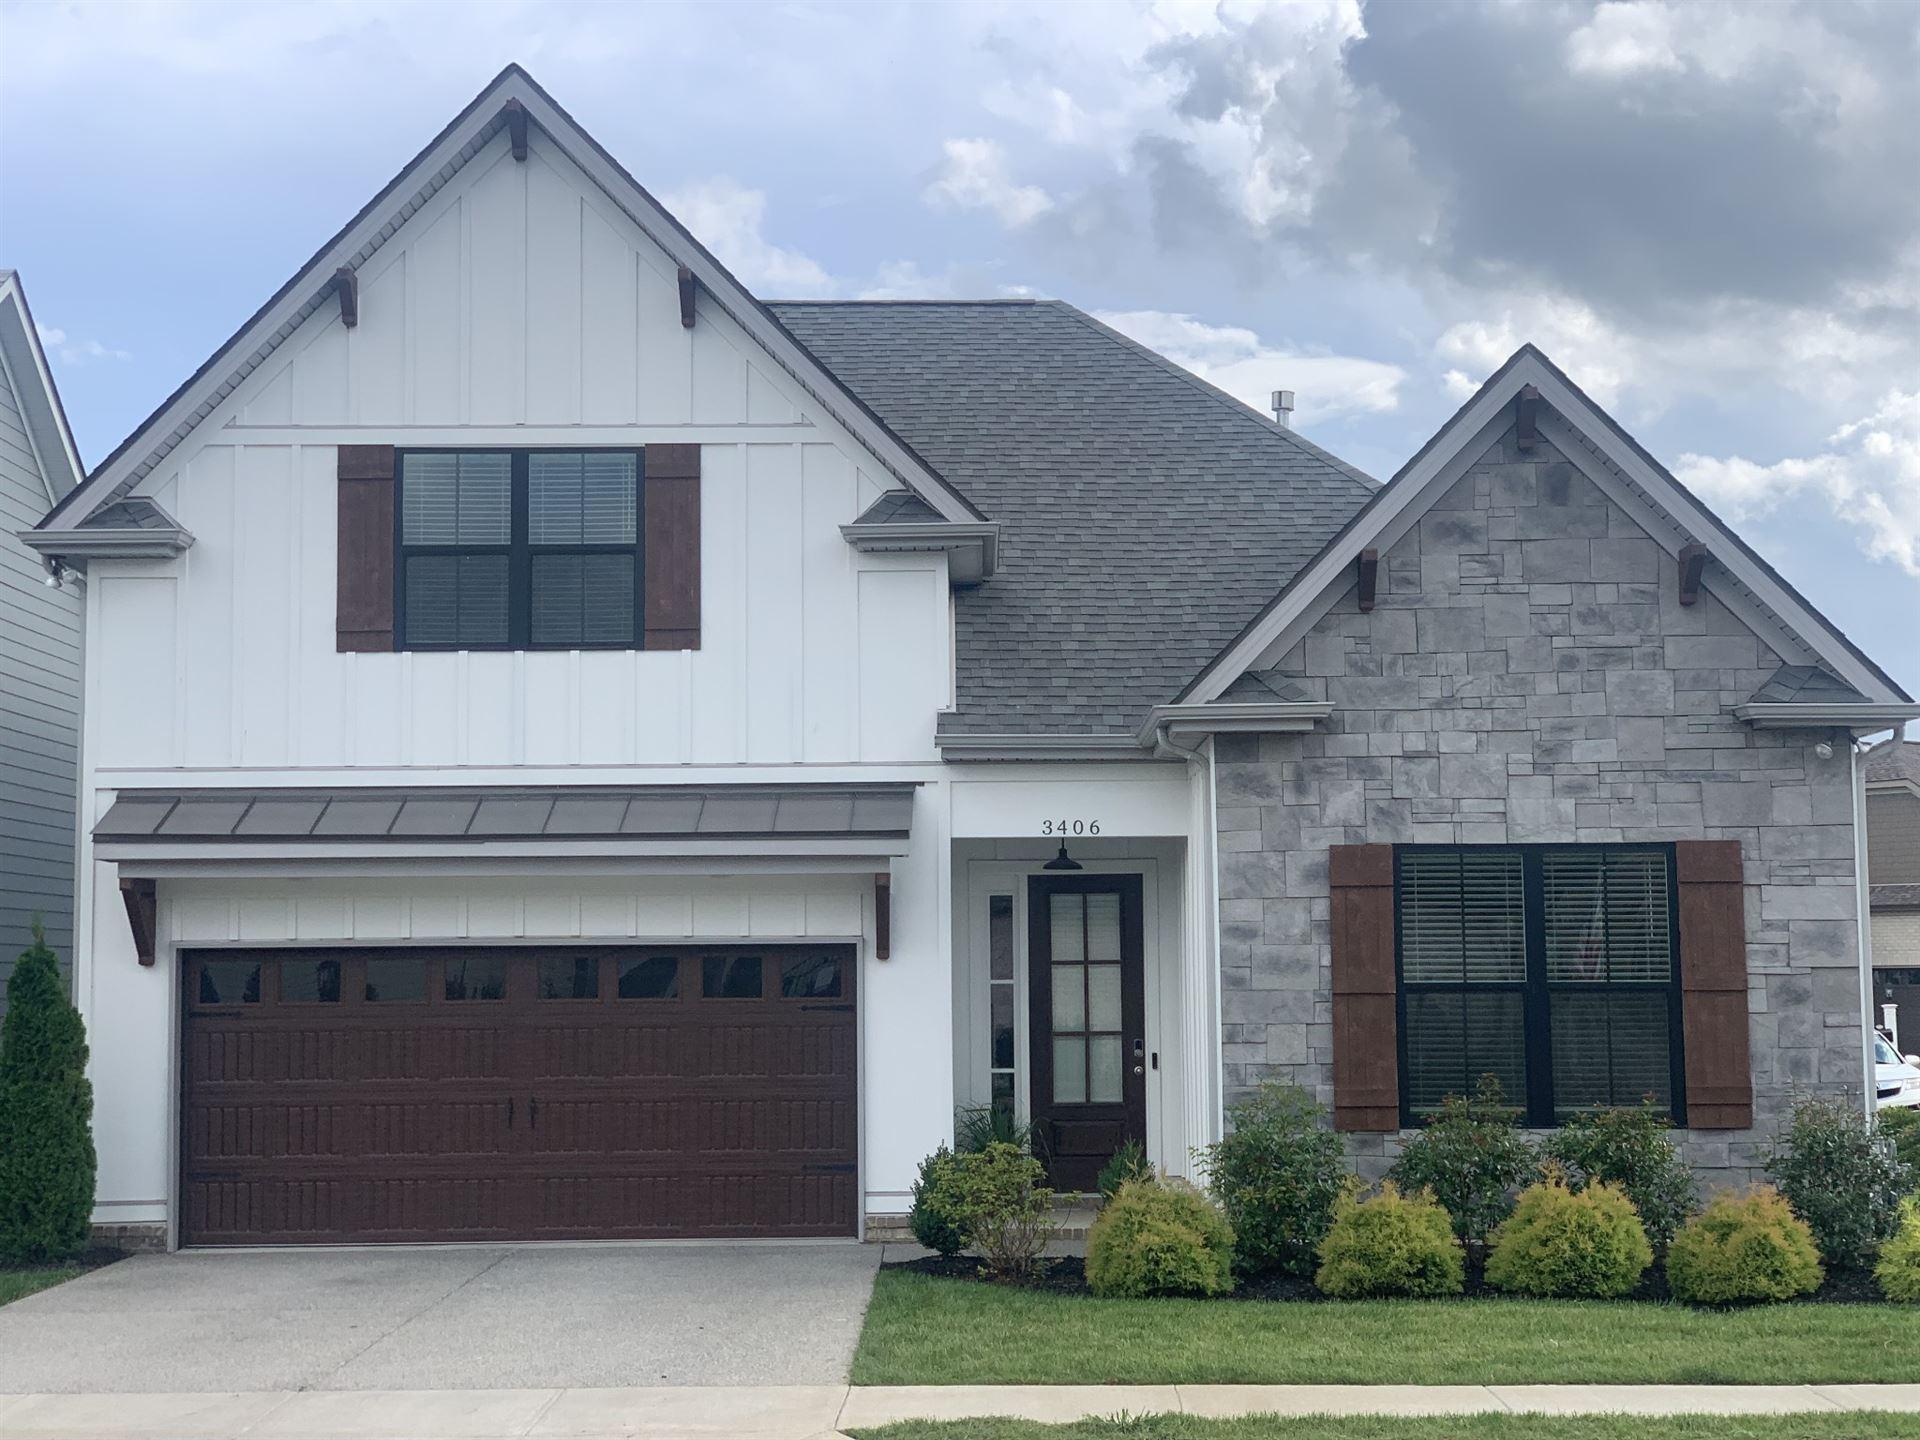 3406 Chianti Circle, Murfreesboro, TN 37129 - MLS#: 2283638